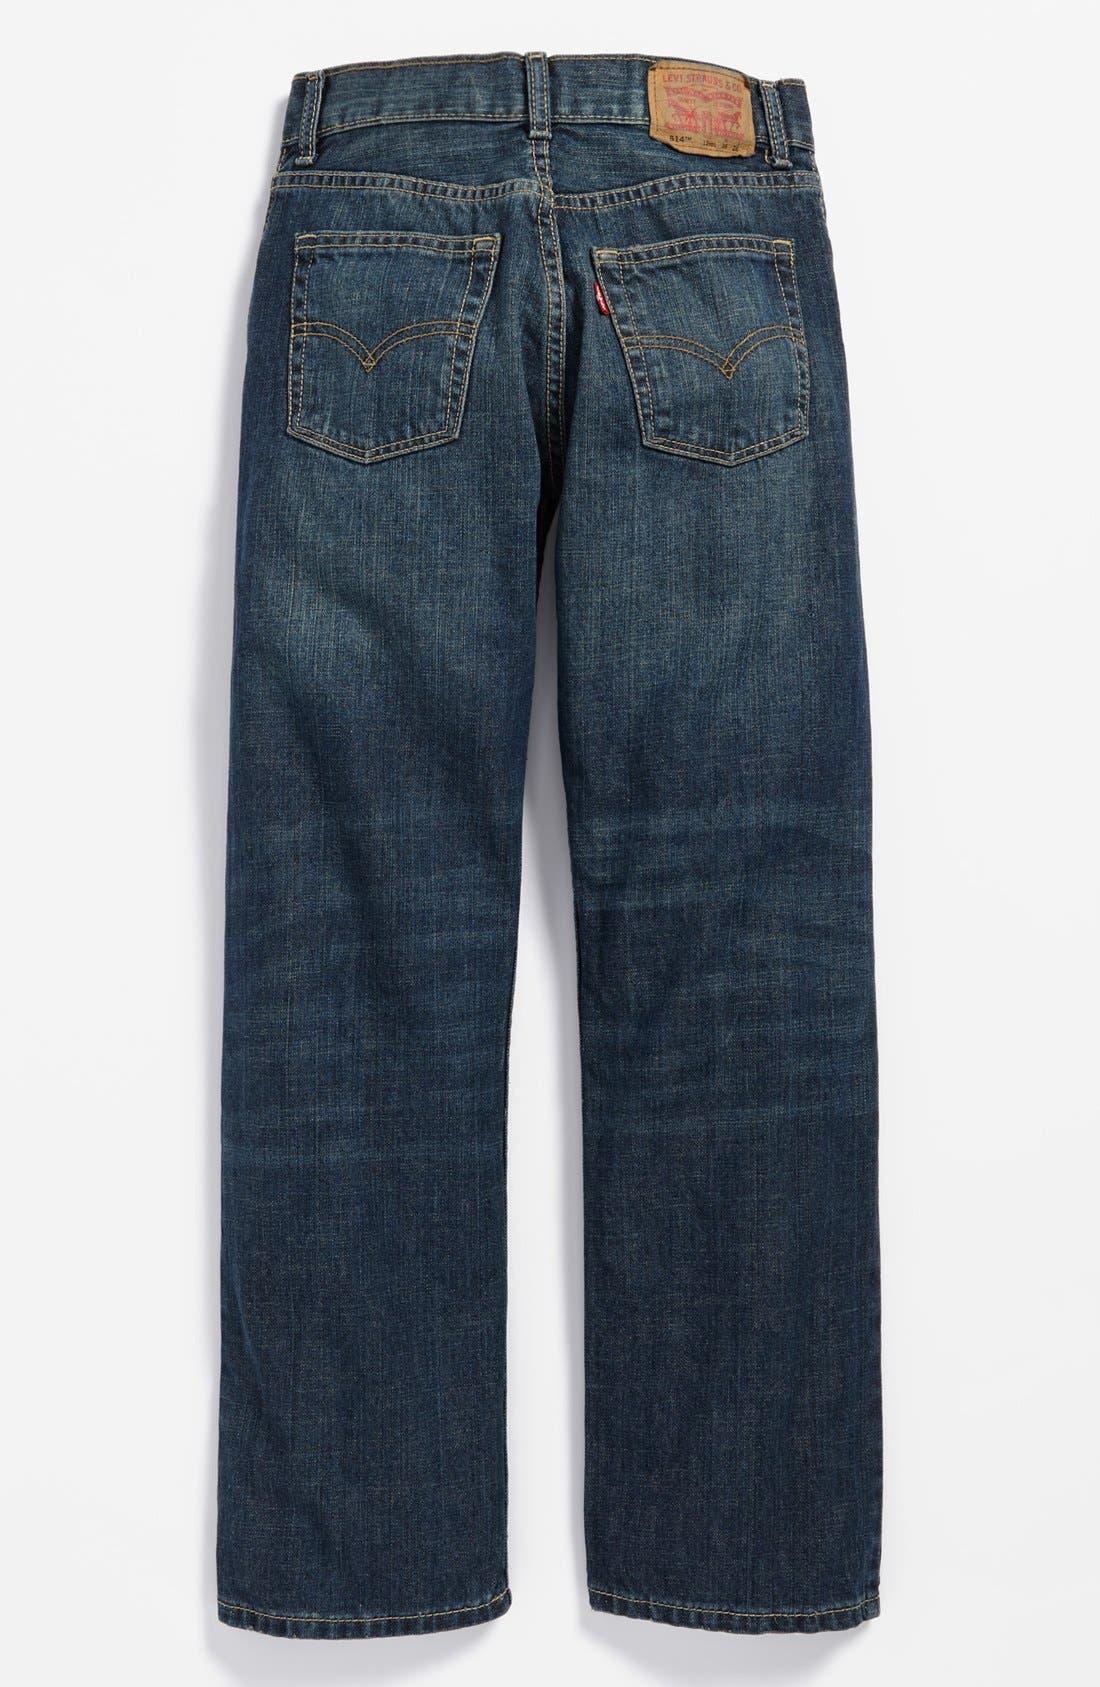 Alternate Image 1 Selected - Levi's® '514™' Straight Leg Jeans (Big Boys)